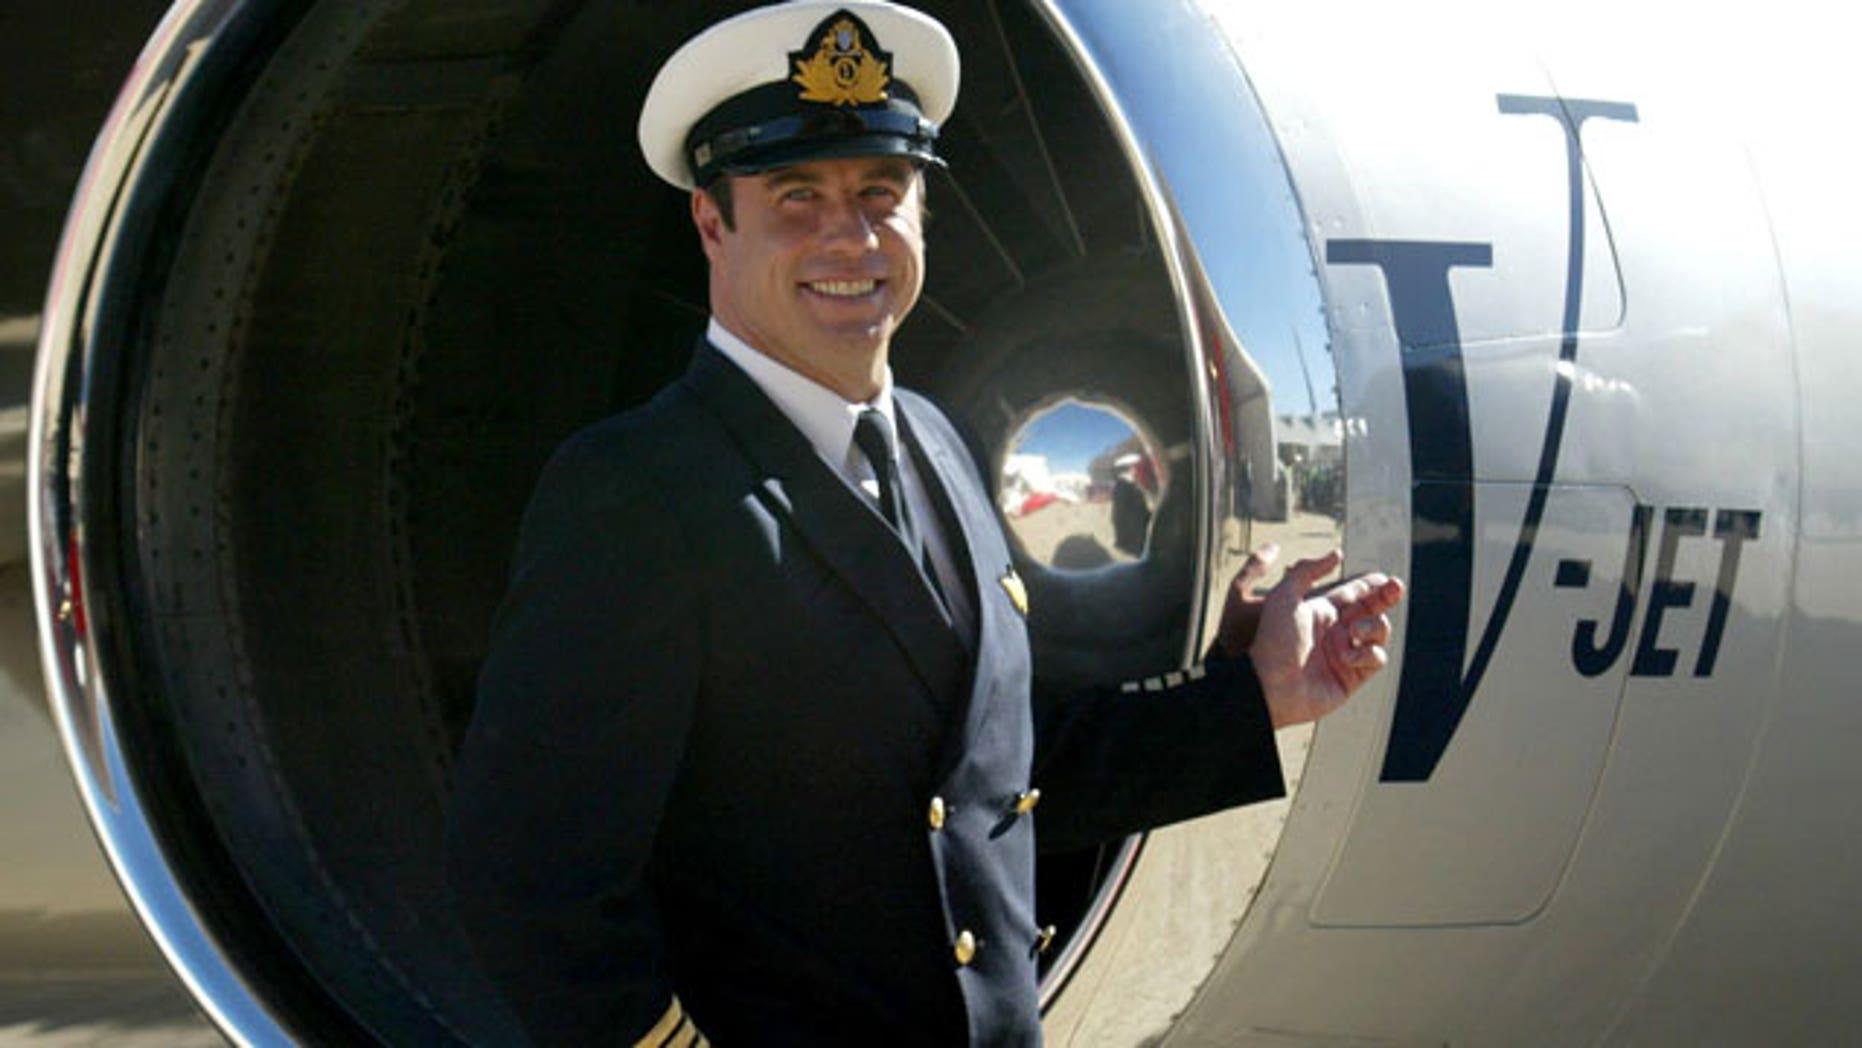 FILE: John Travolta, shown in front of his jet in 2002.